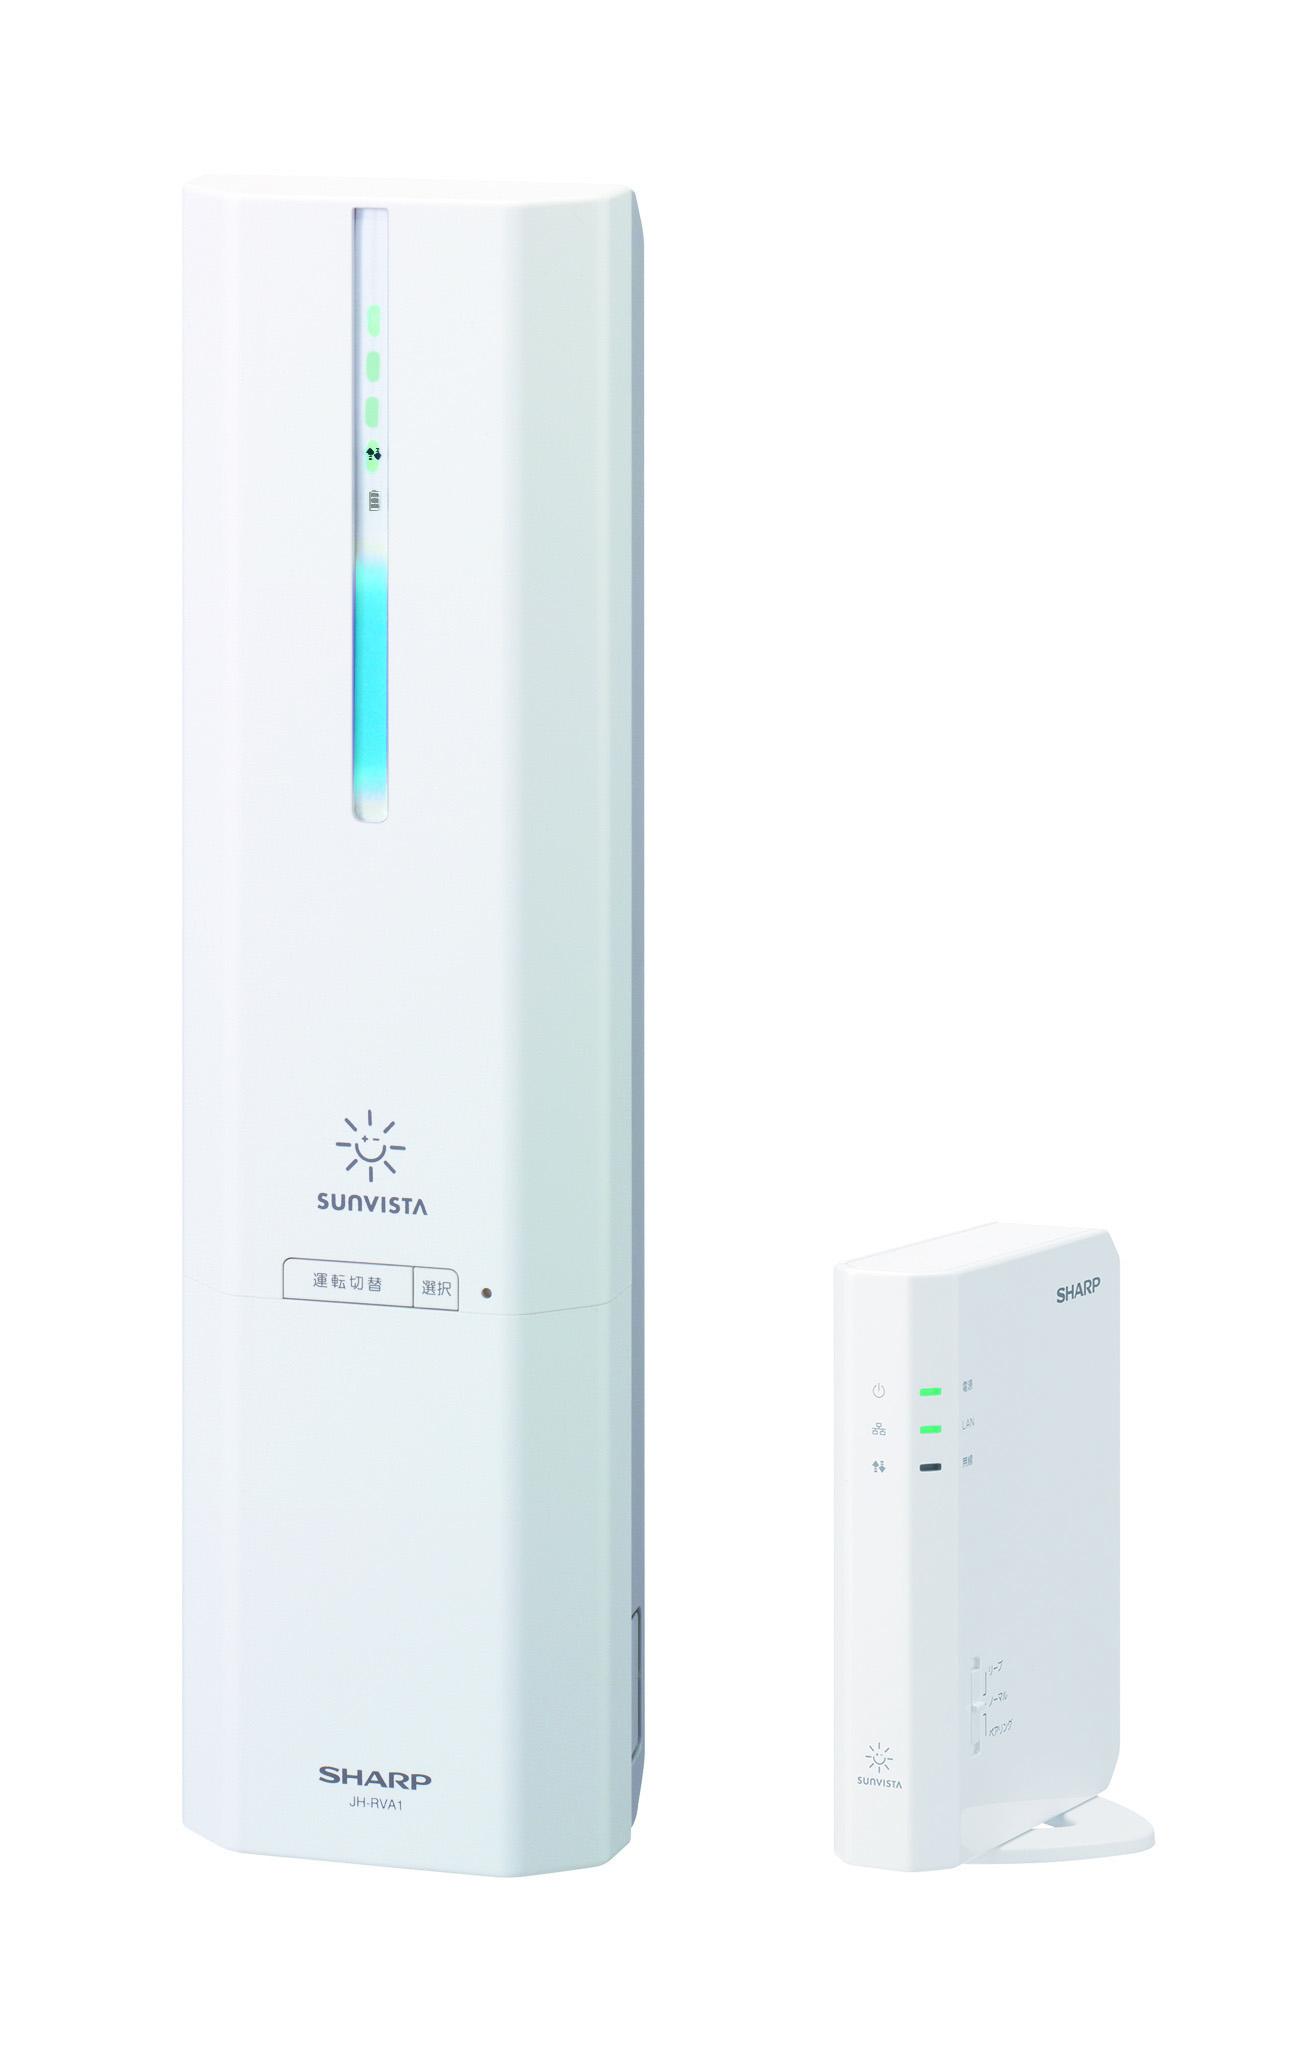 Cloud Based Energy Controller Echonet